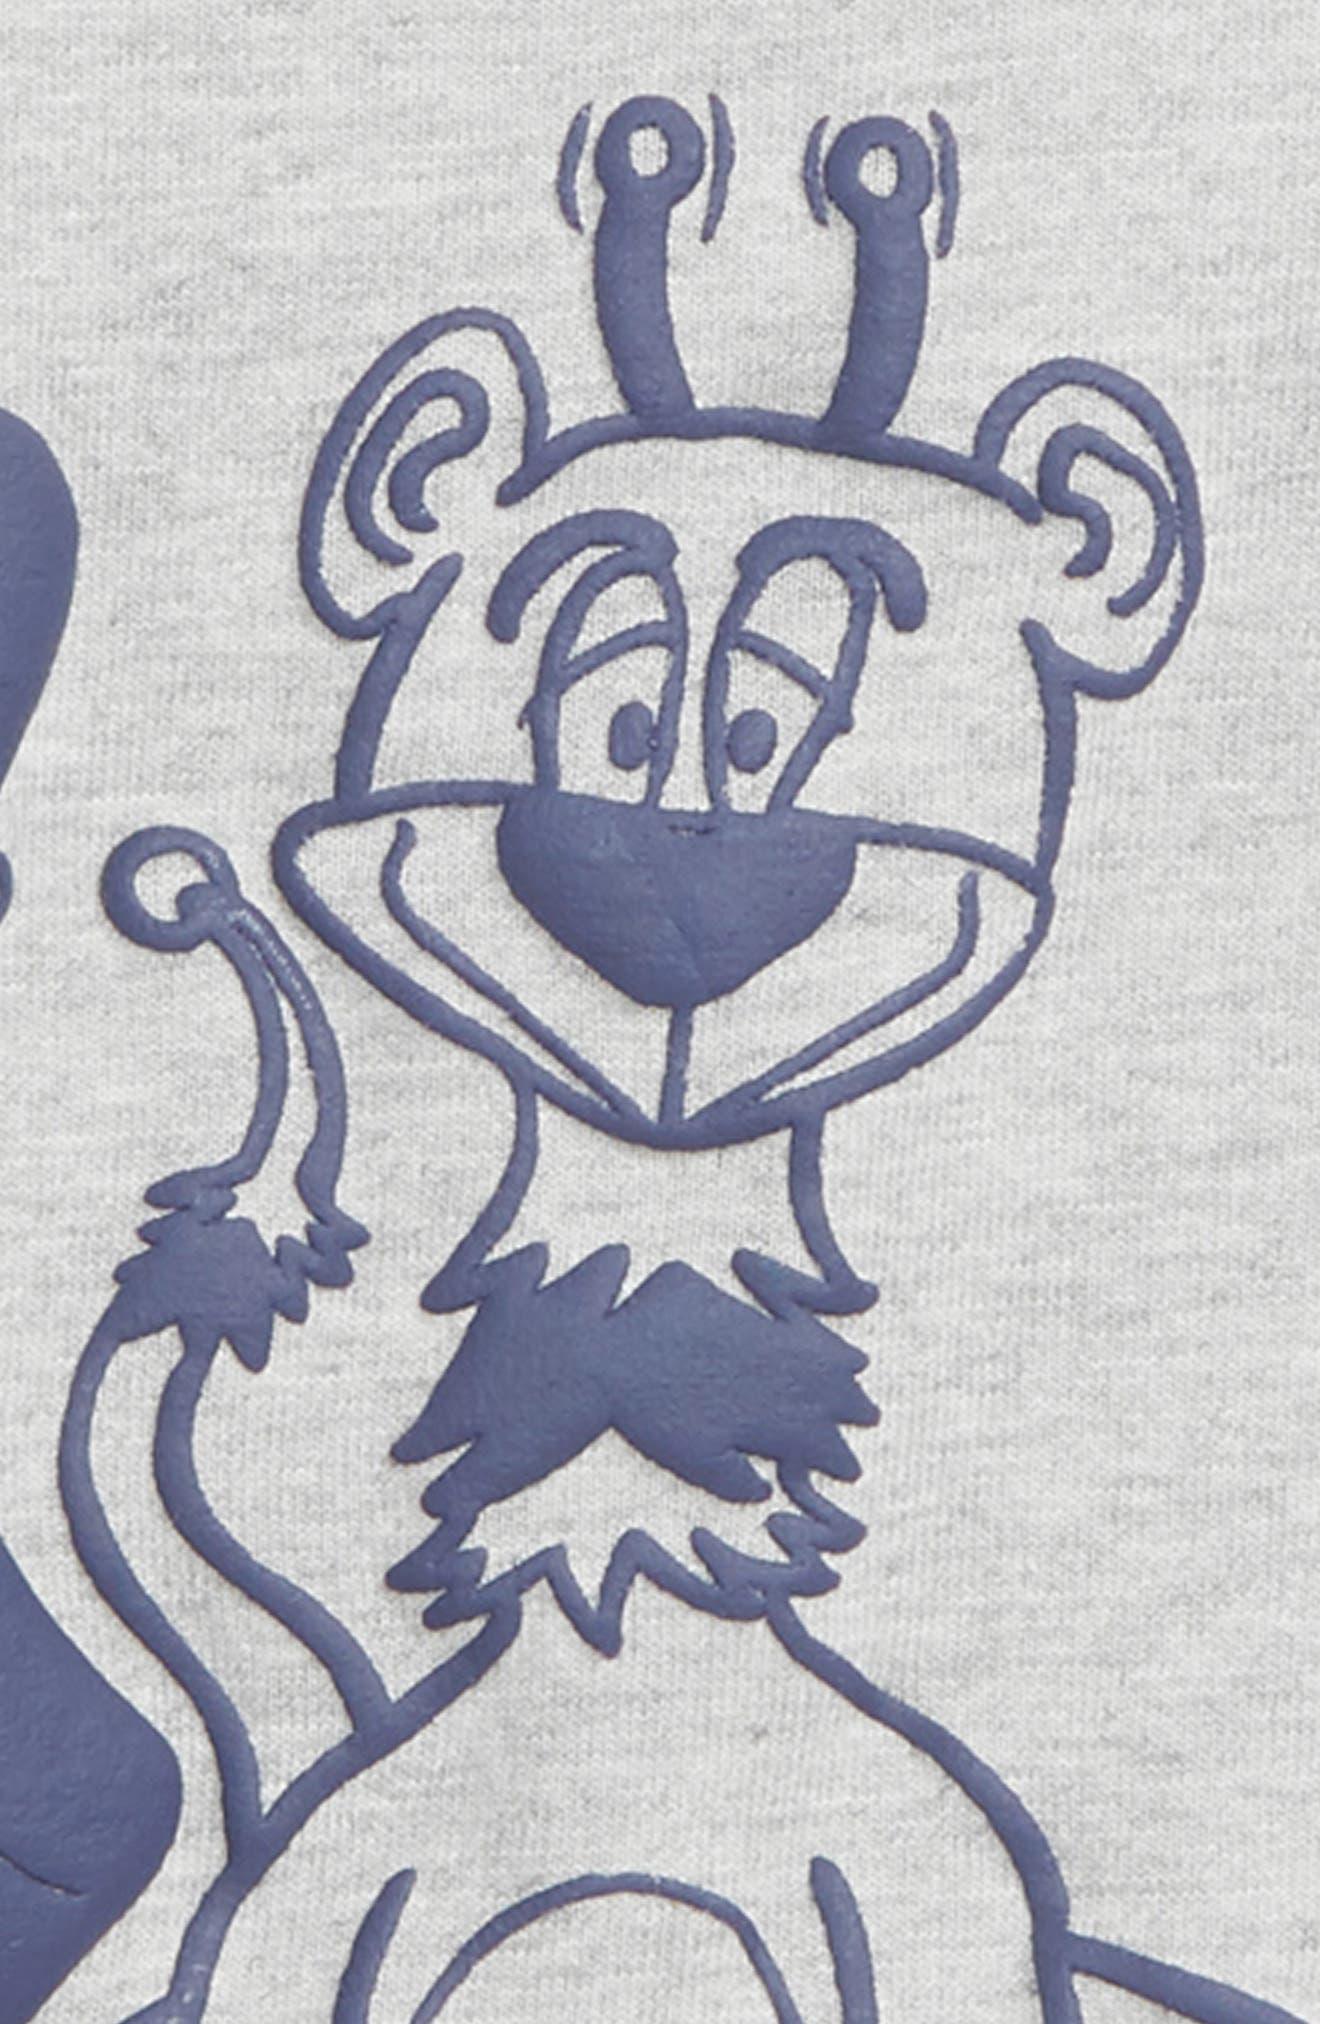 BILLIONAIRE BOYS CLUB,                             Zookeeper T-Shirt,                             Alternate thumbnail 2, color,                             HEATHER GREY